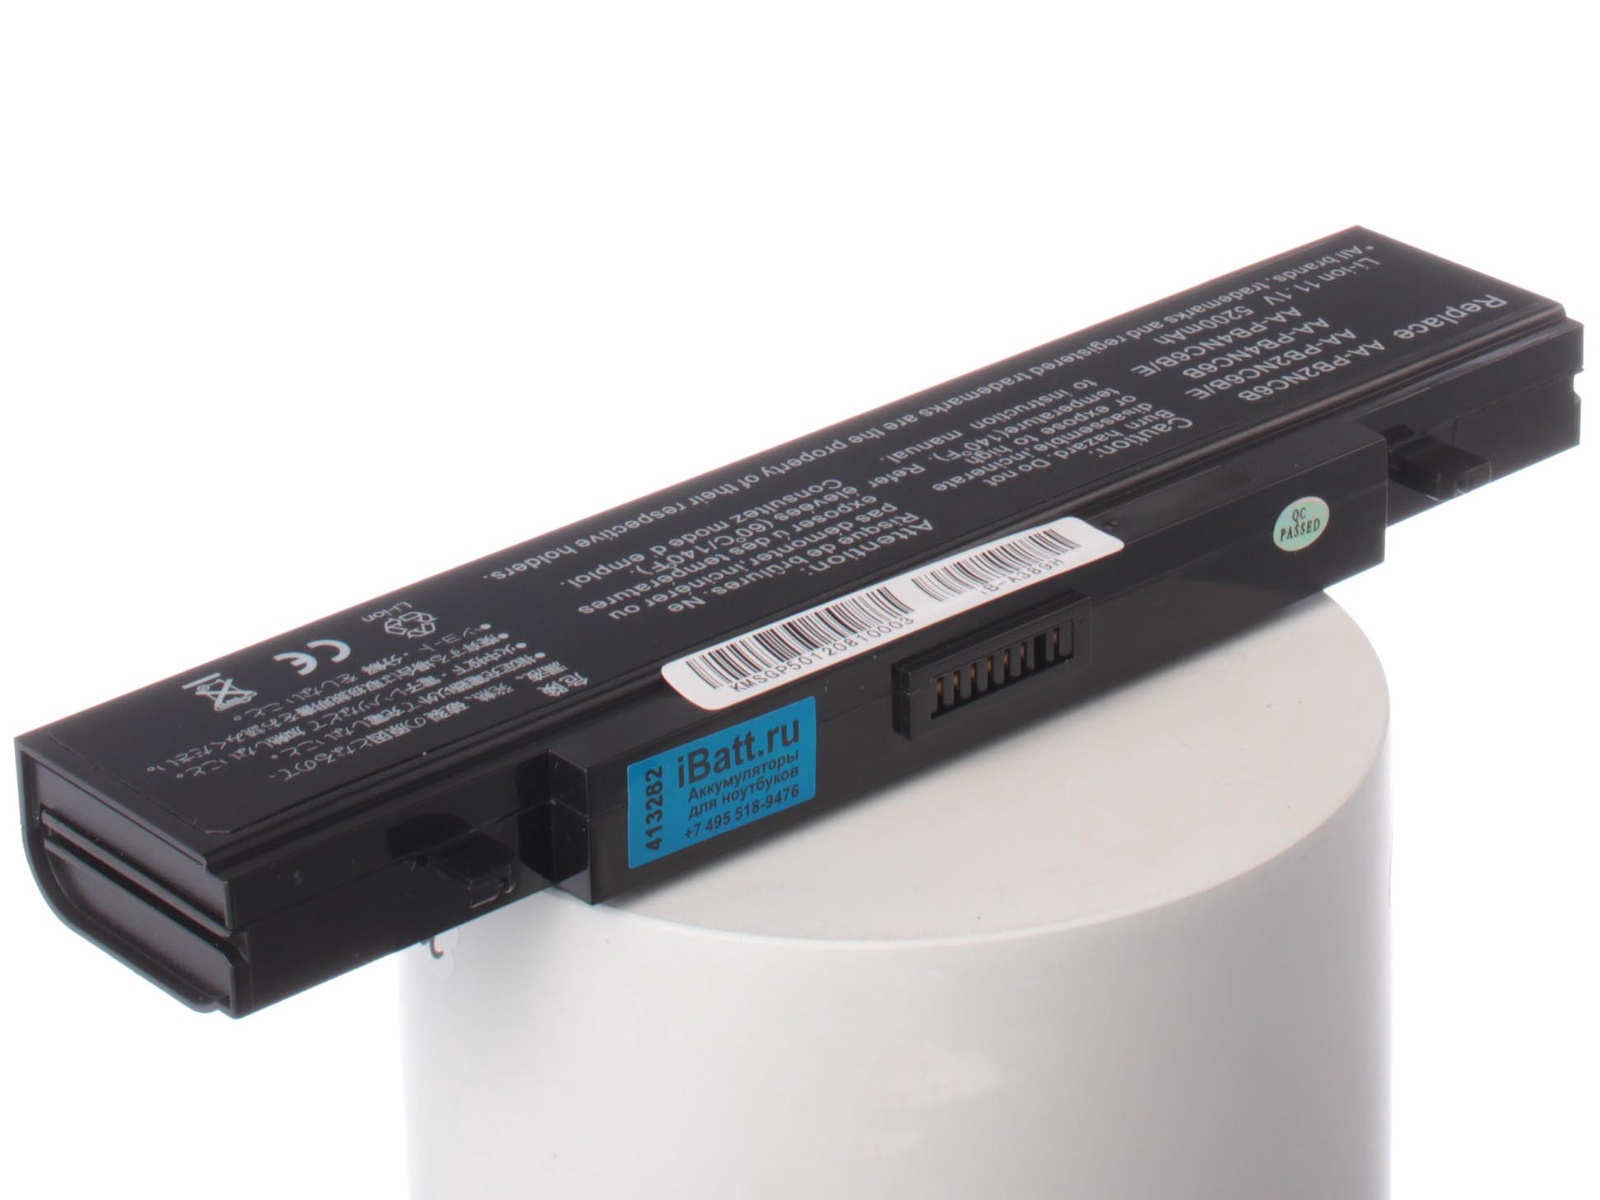 Аккумулятор для ноутбука iBatt Samsung AA-PB4NC6B, AA-PB2NC6B, AA-PL2NC9B, AA-PB2NC3B, AA-PB6NC6B